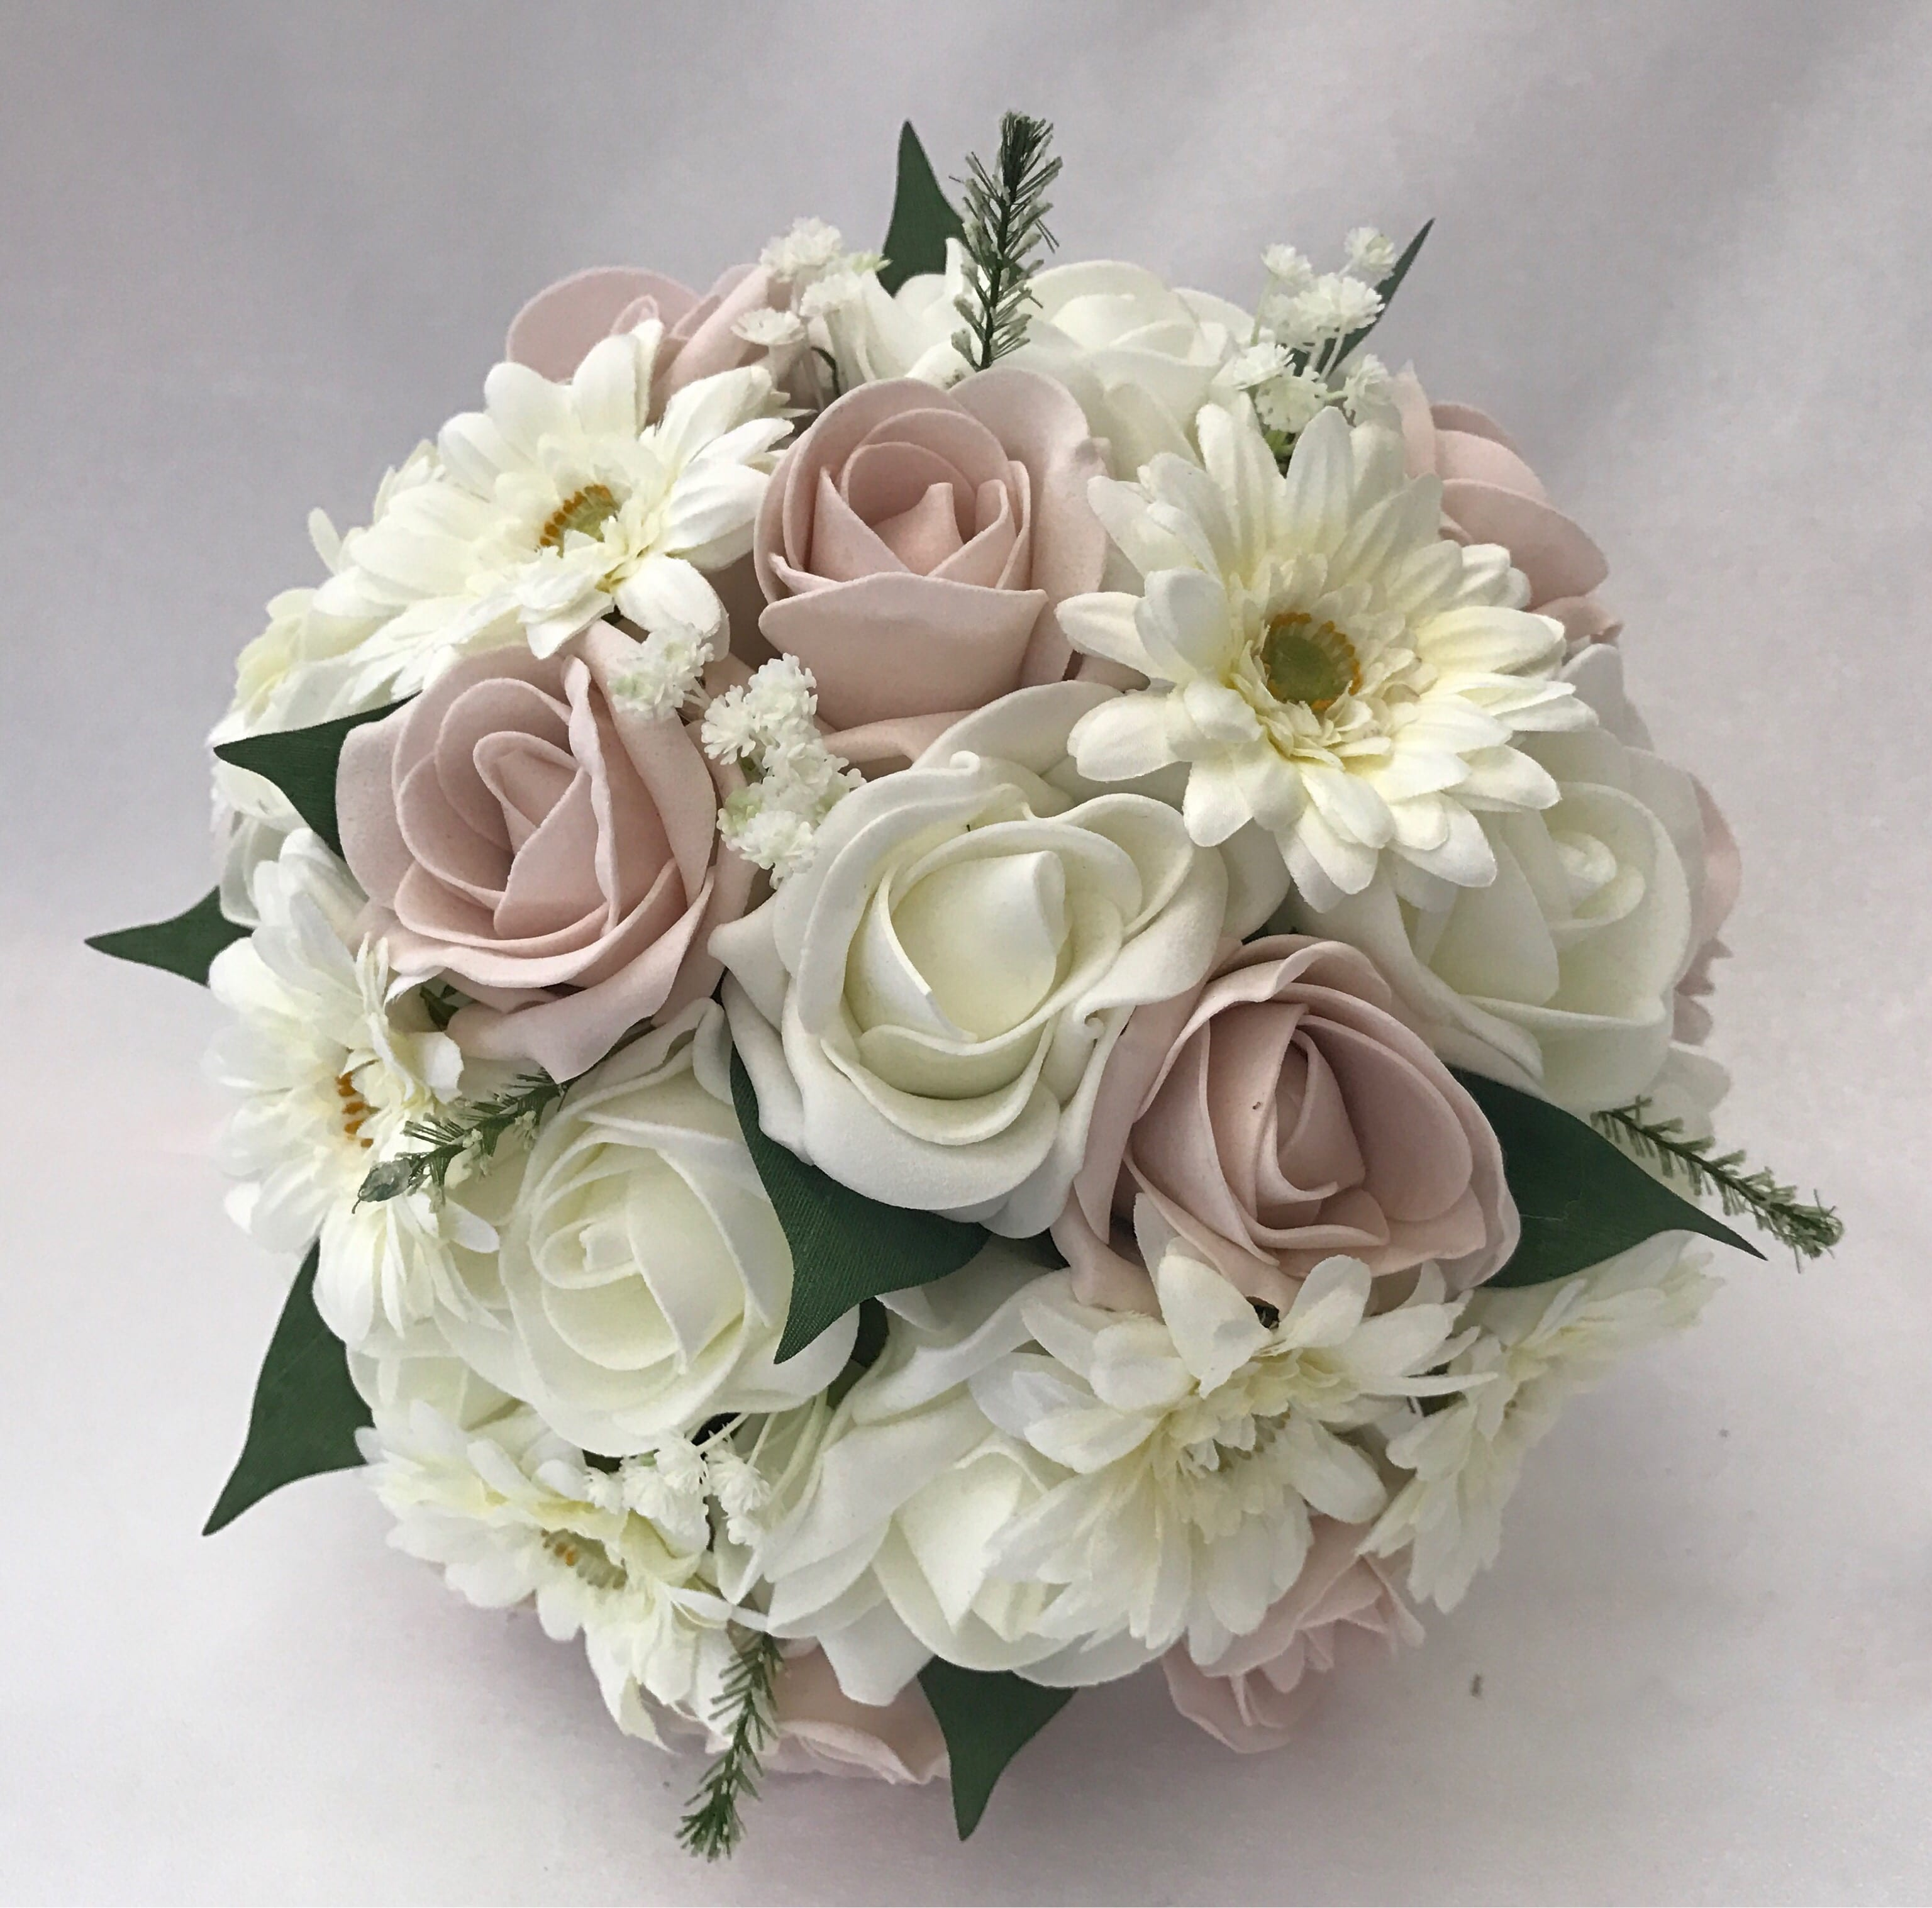 Gerbera Flower Wedding Bouquets: Medium Artificial Wedding Flowers Bridesmaid Bouquet Posy